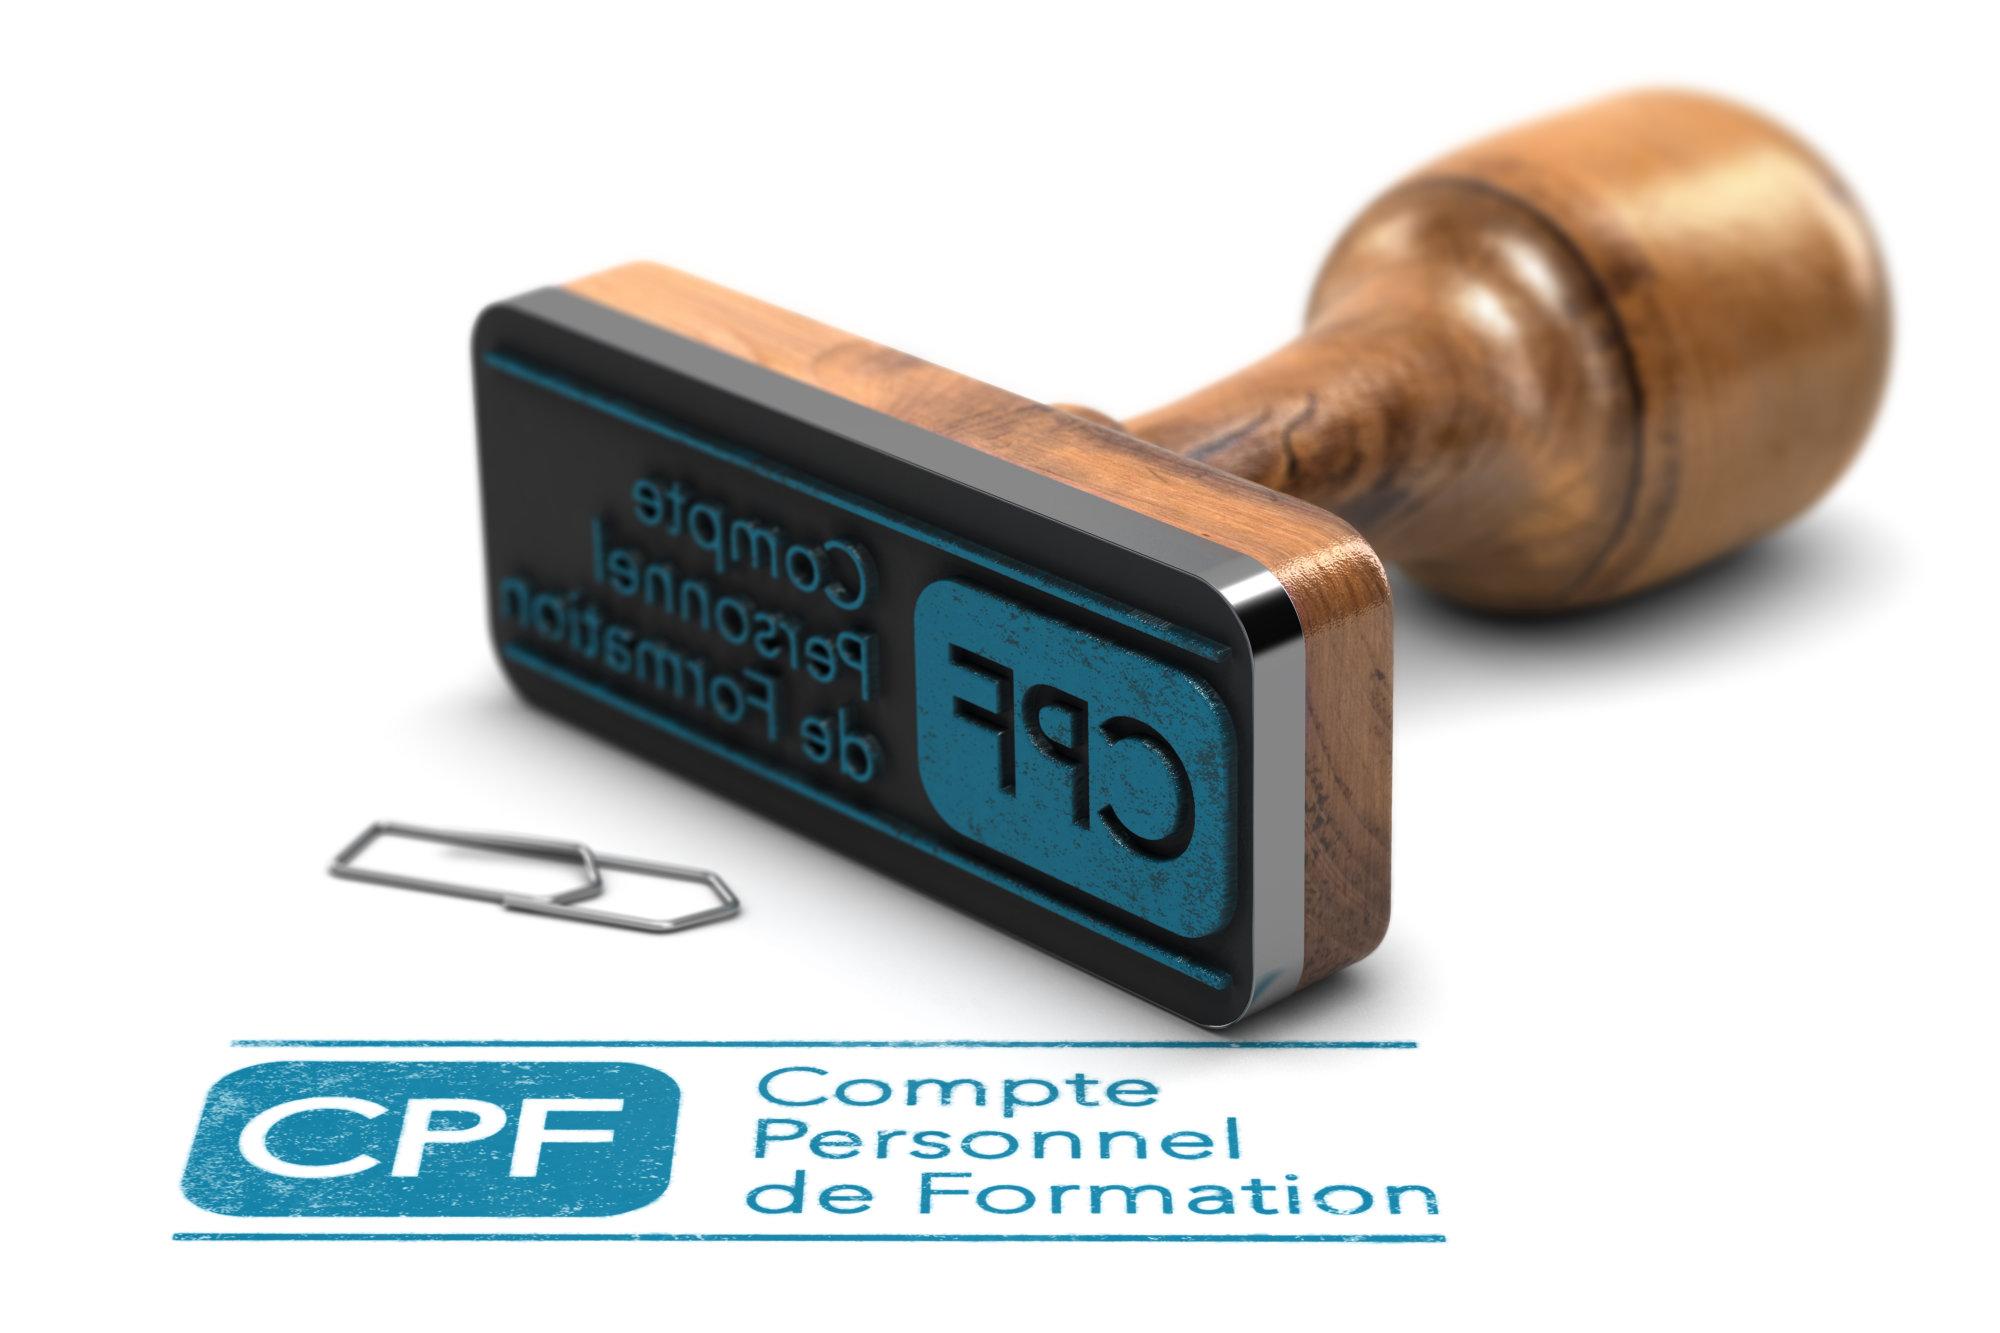 CPF, Compte Personnel De Formation